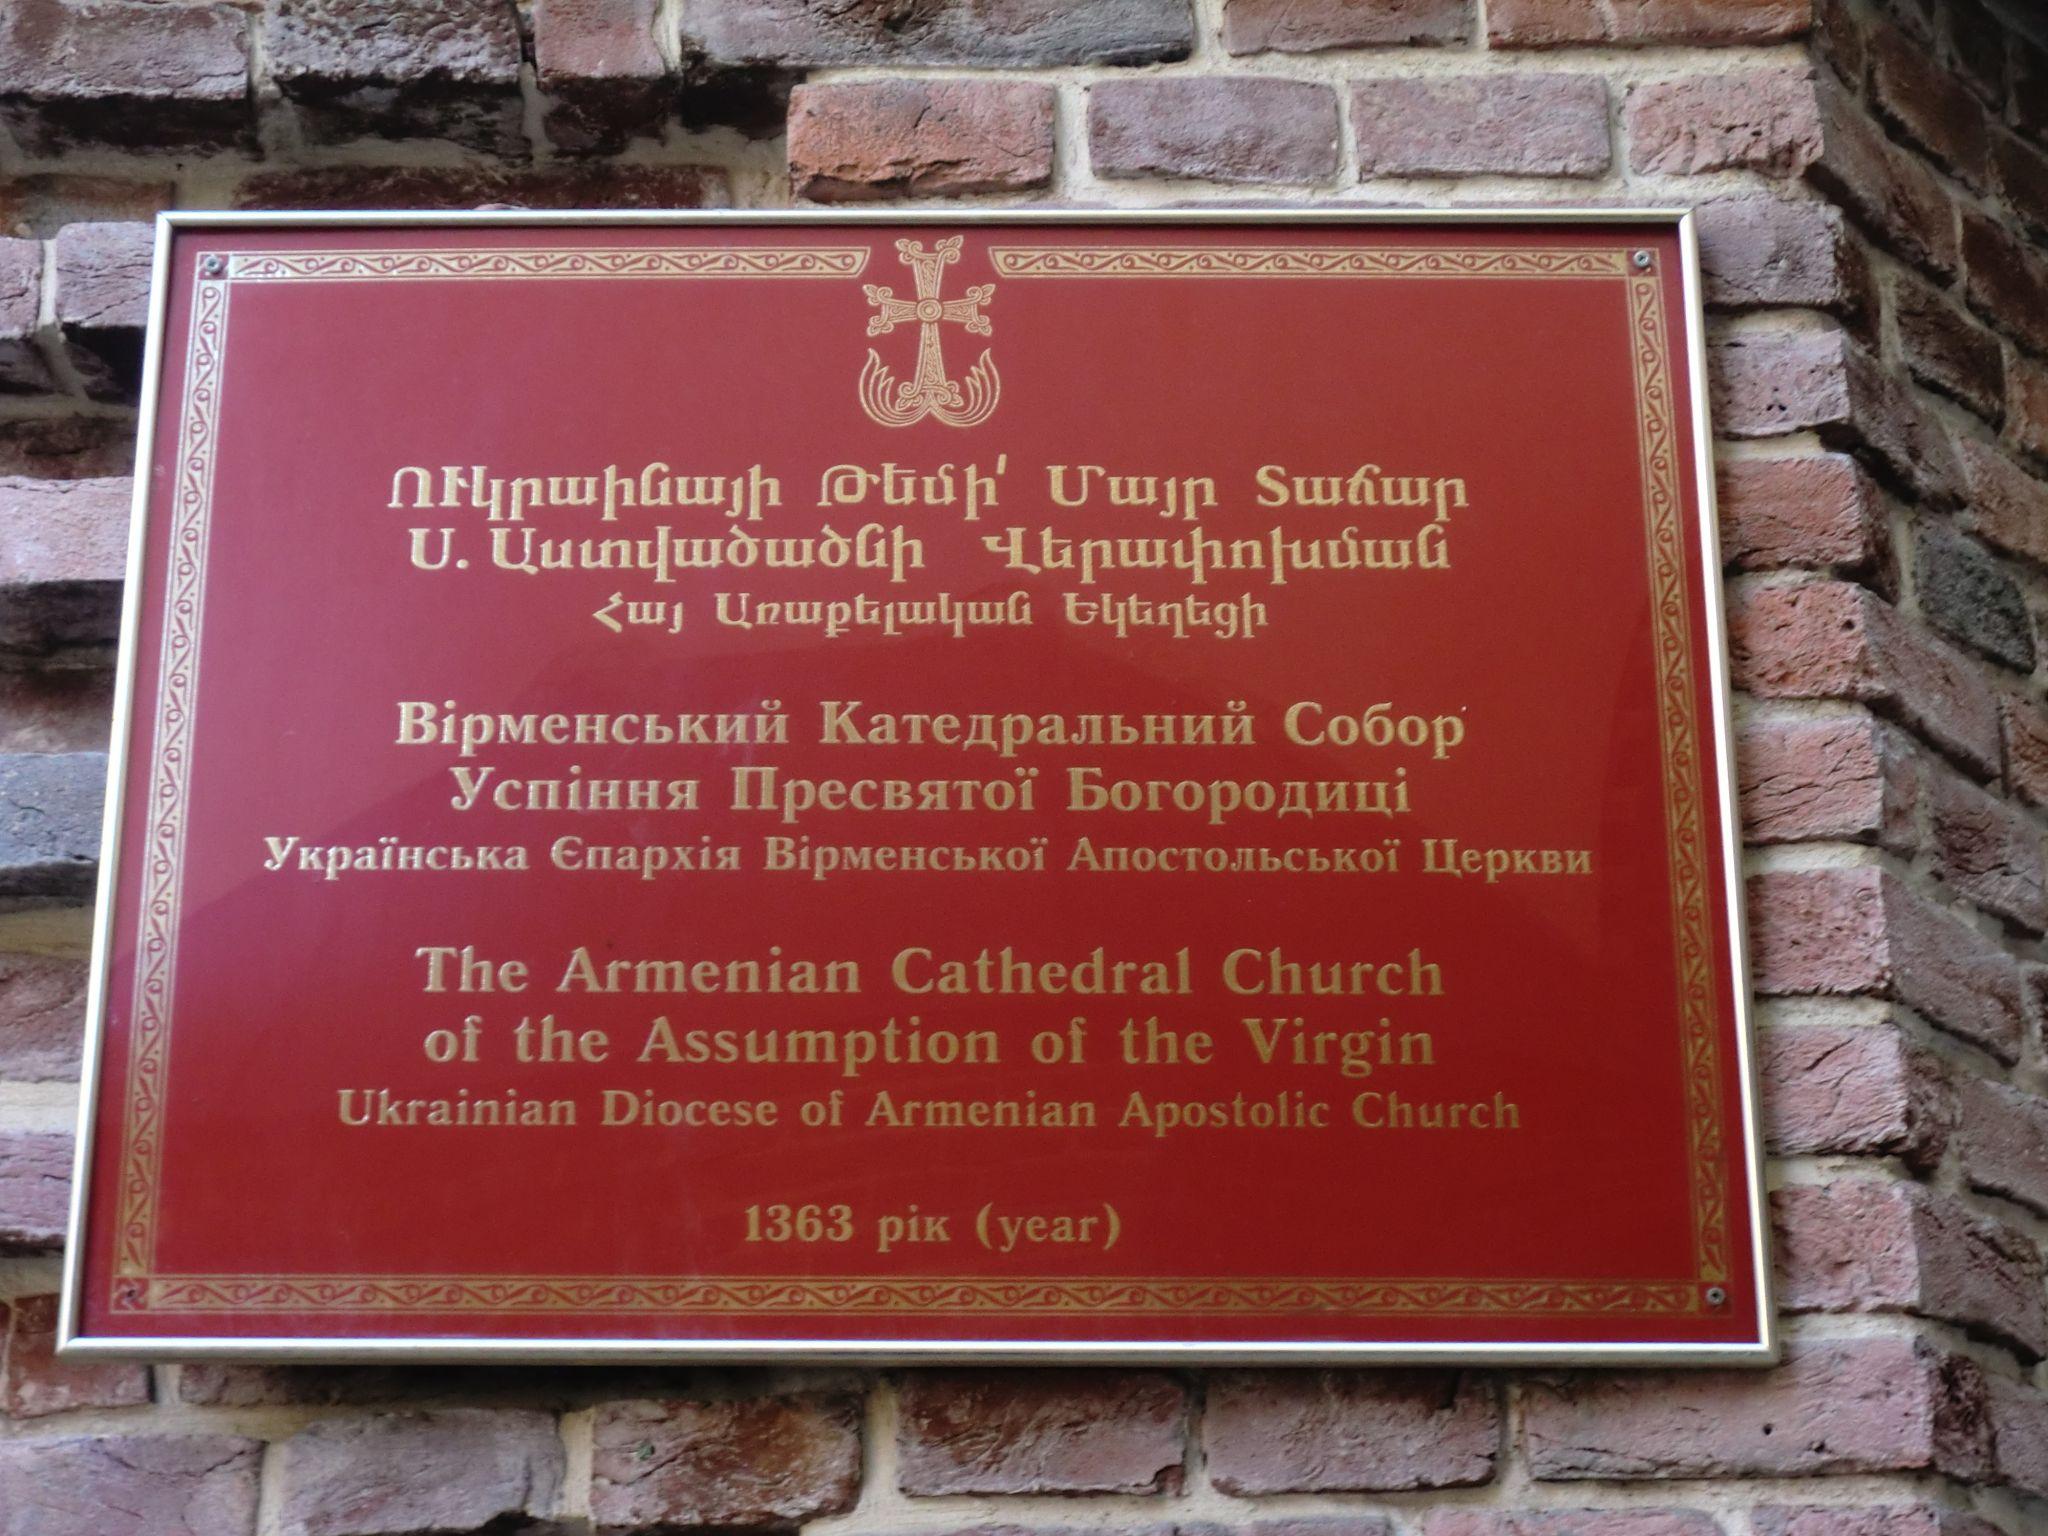 Lviv Armenian cathedral - Lviv, the Ukrainian pearl